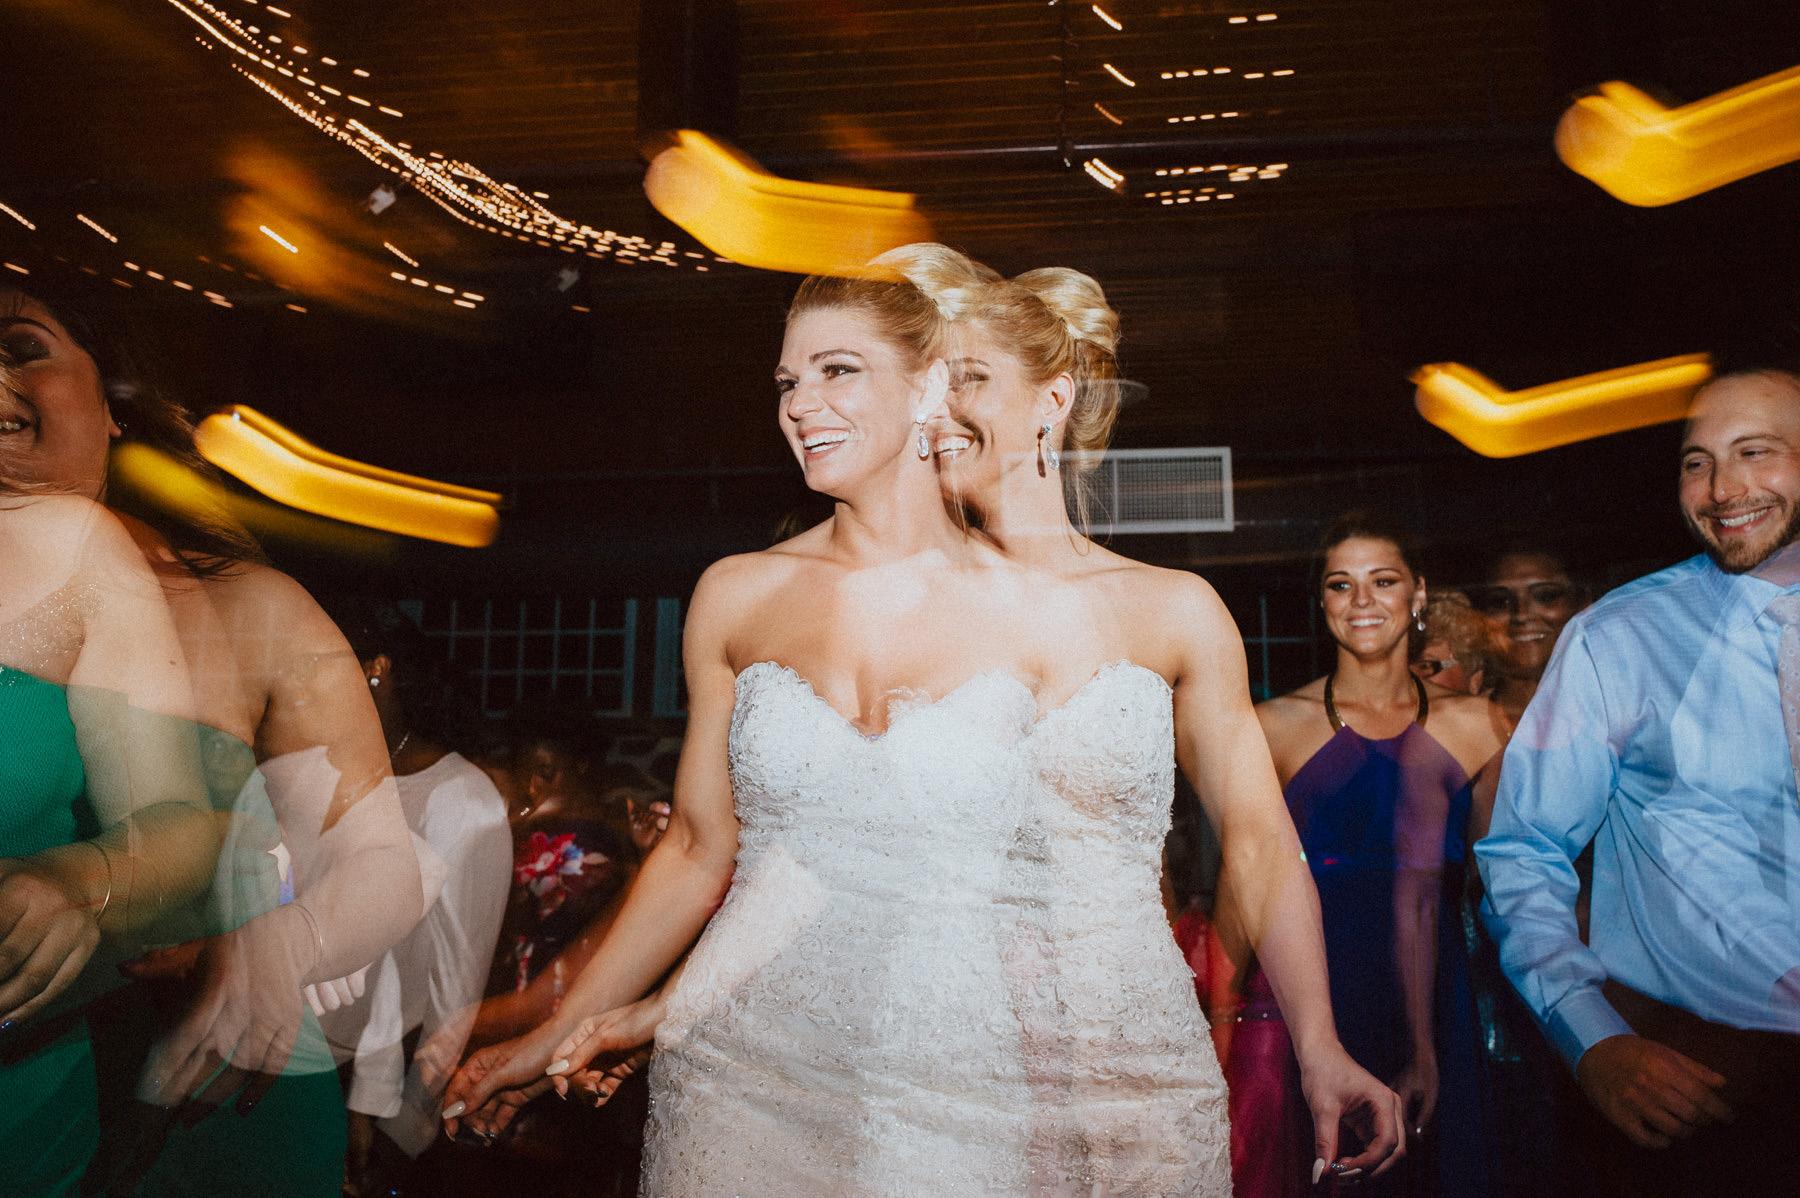 226-rockwood-carraige-house-wedding-7-2.jpg